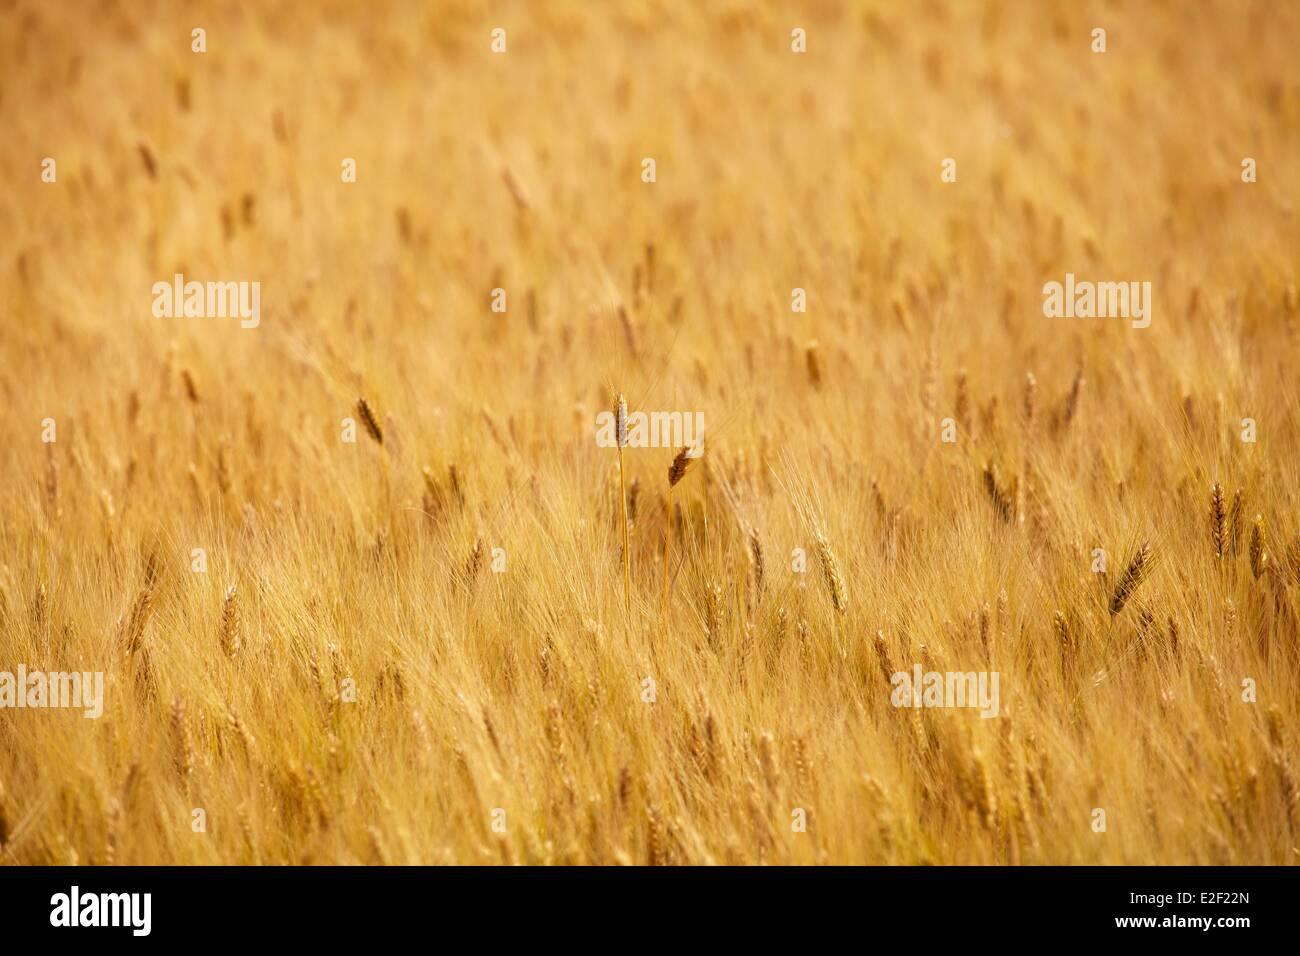 France, Indre et Loire, Wheat Field - Stock Image